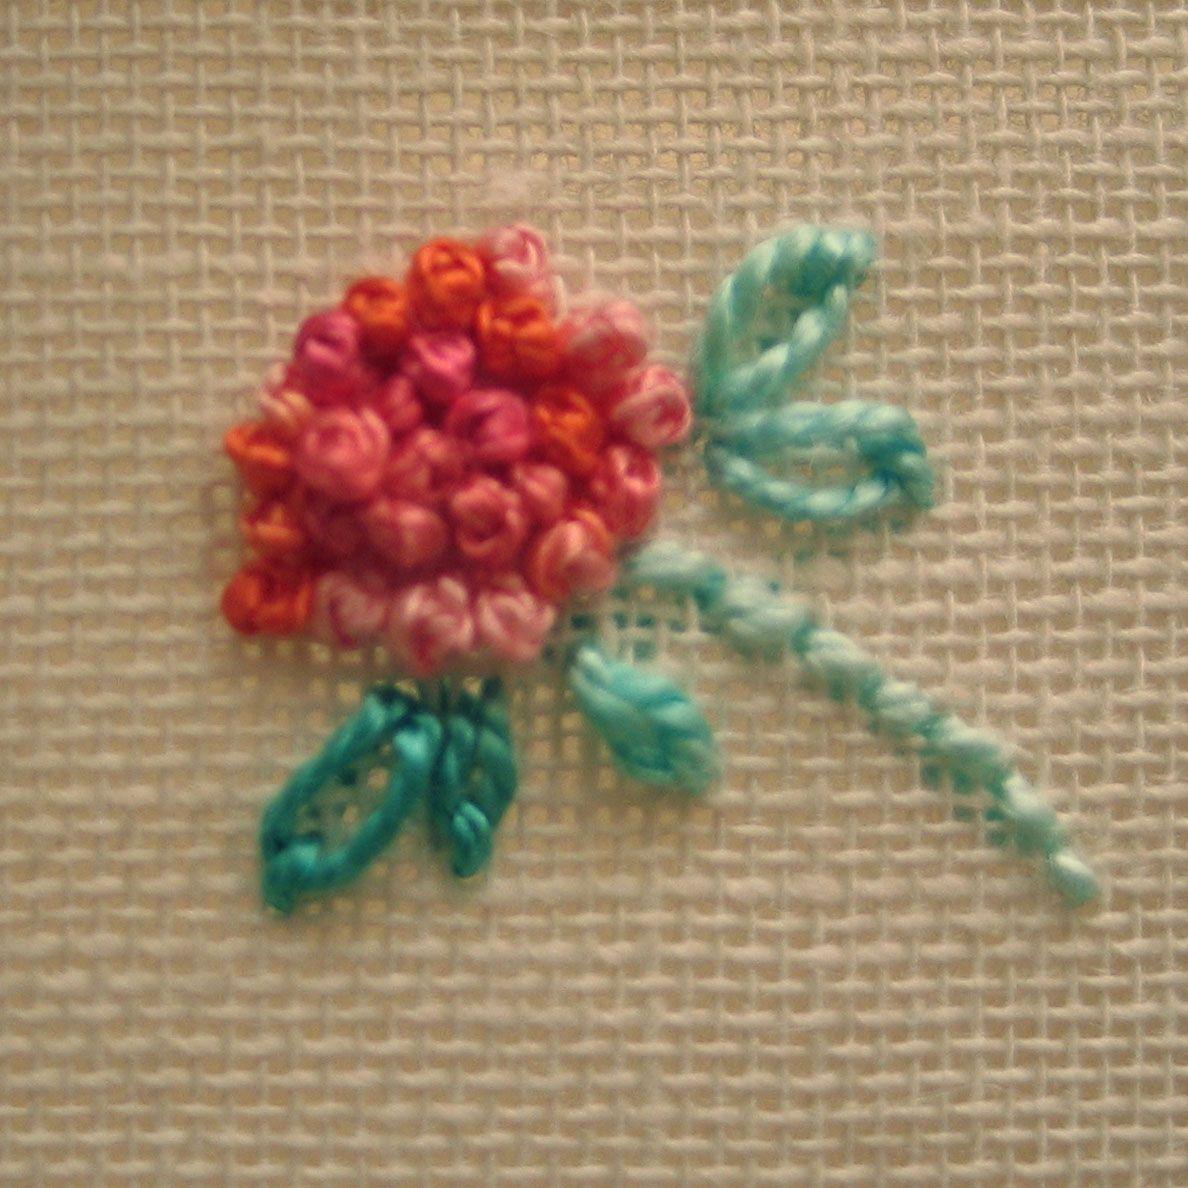 Stitch anatomy french knot knit crochet sew quilt